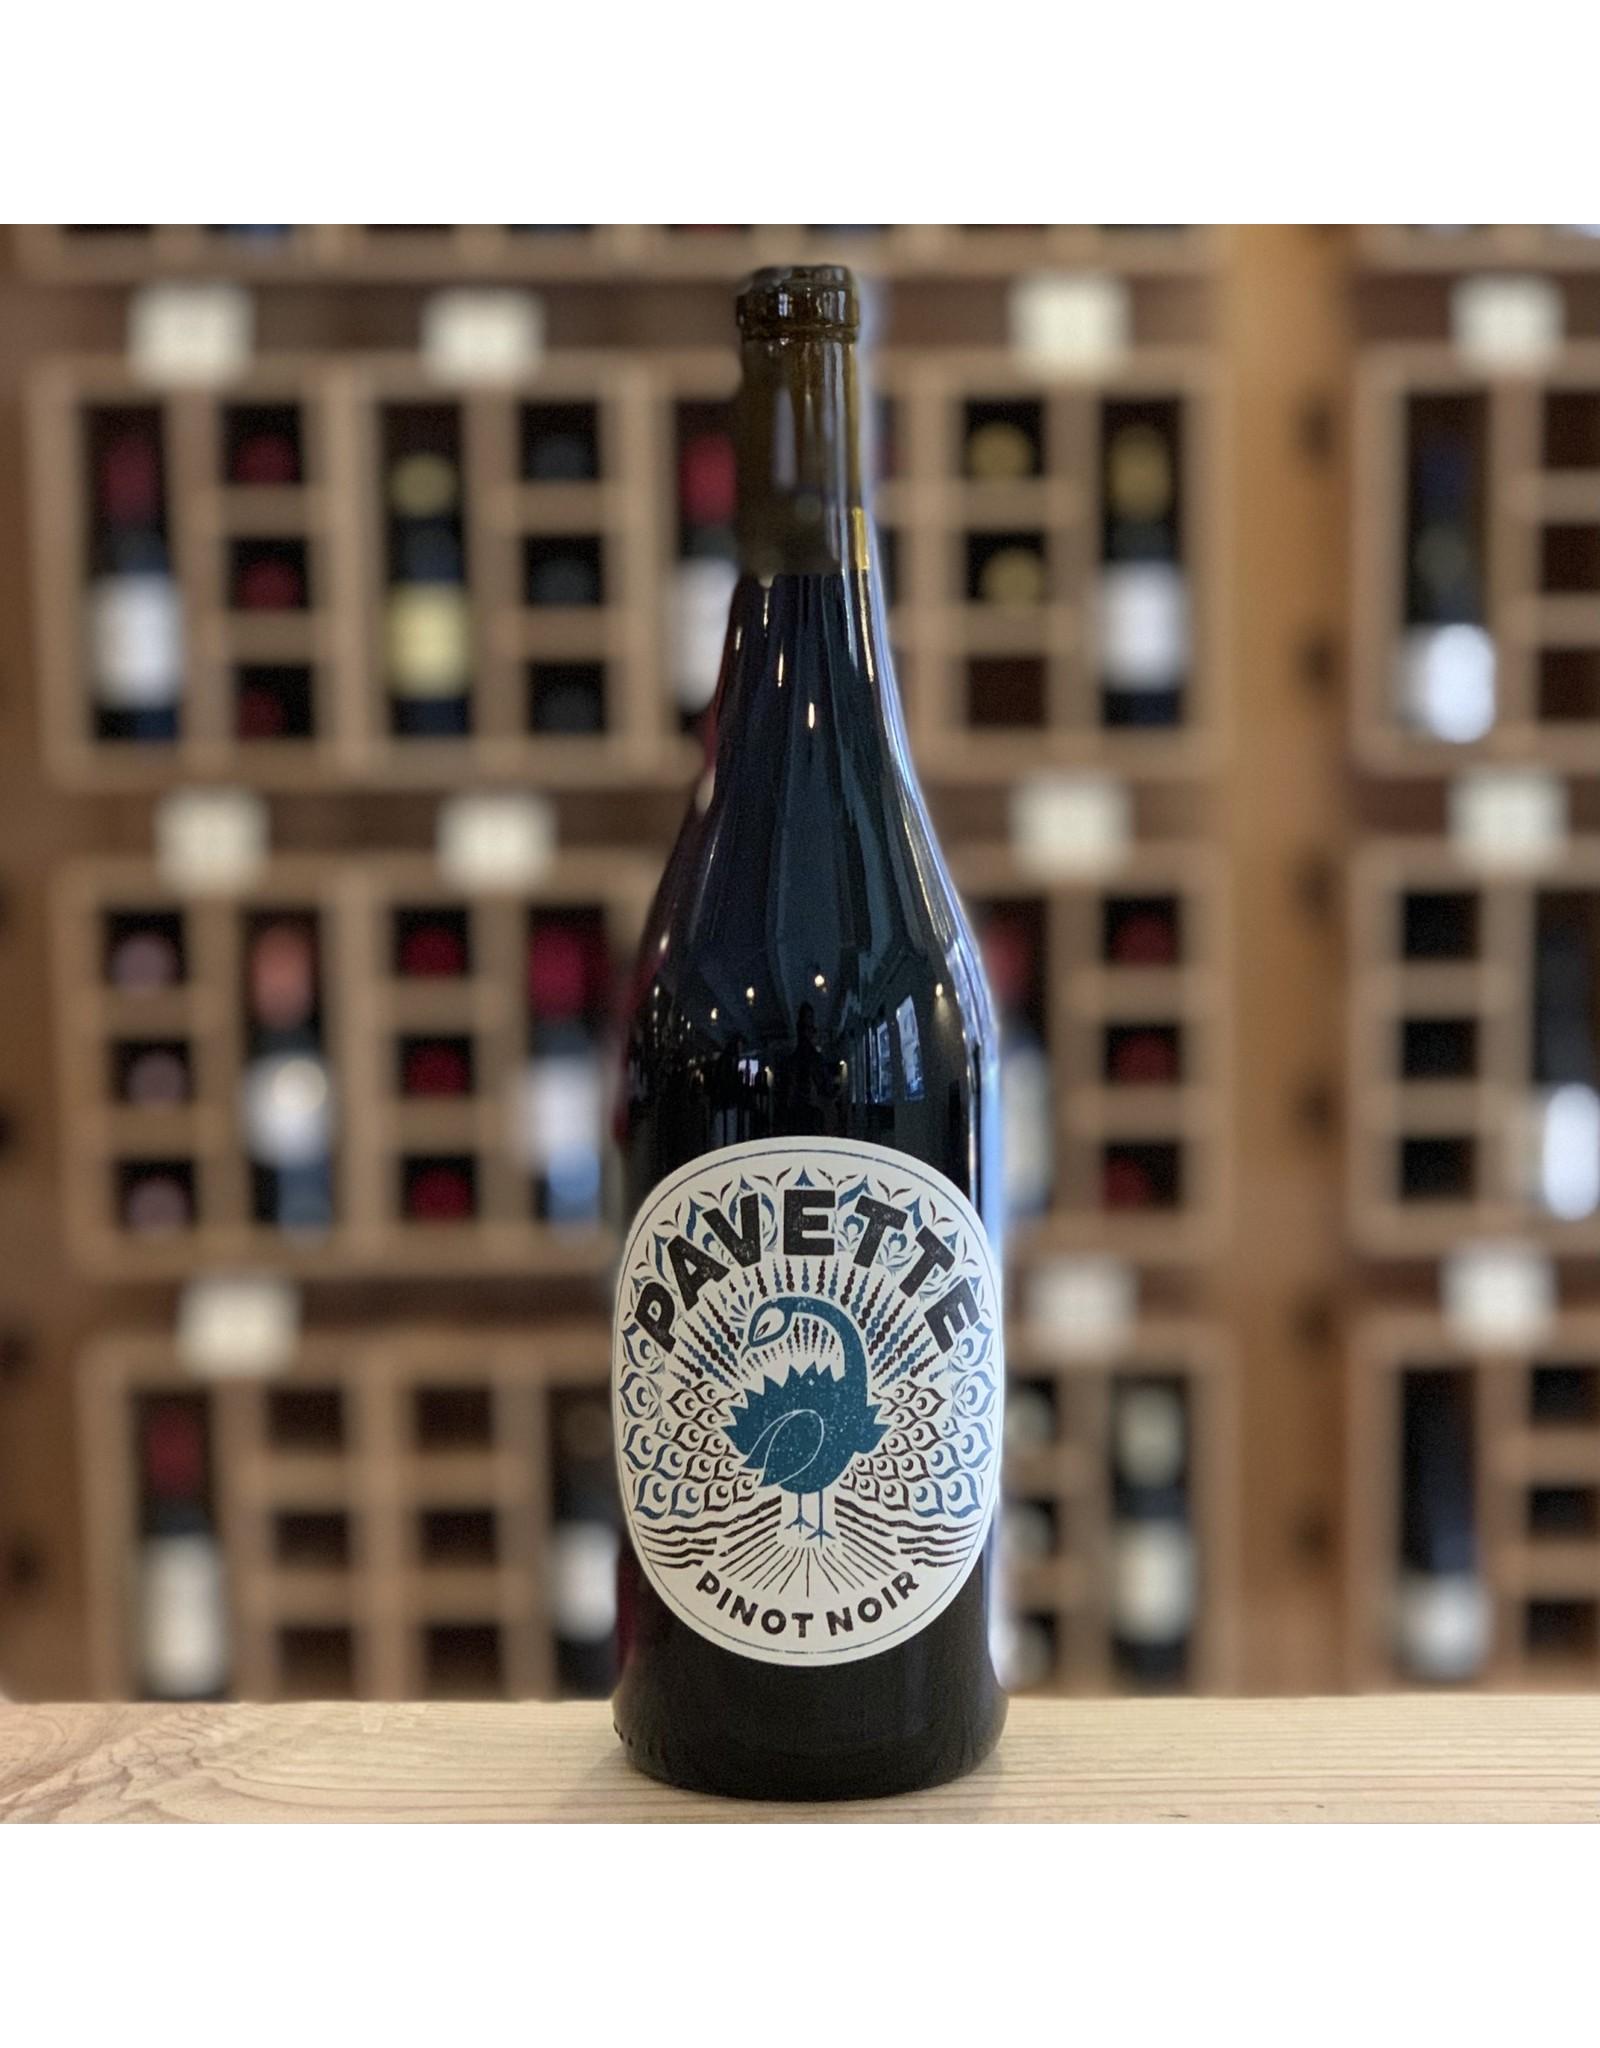 California Pavette Pinot Noir 2020 - California